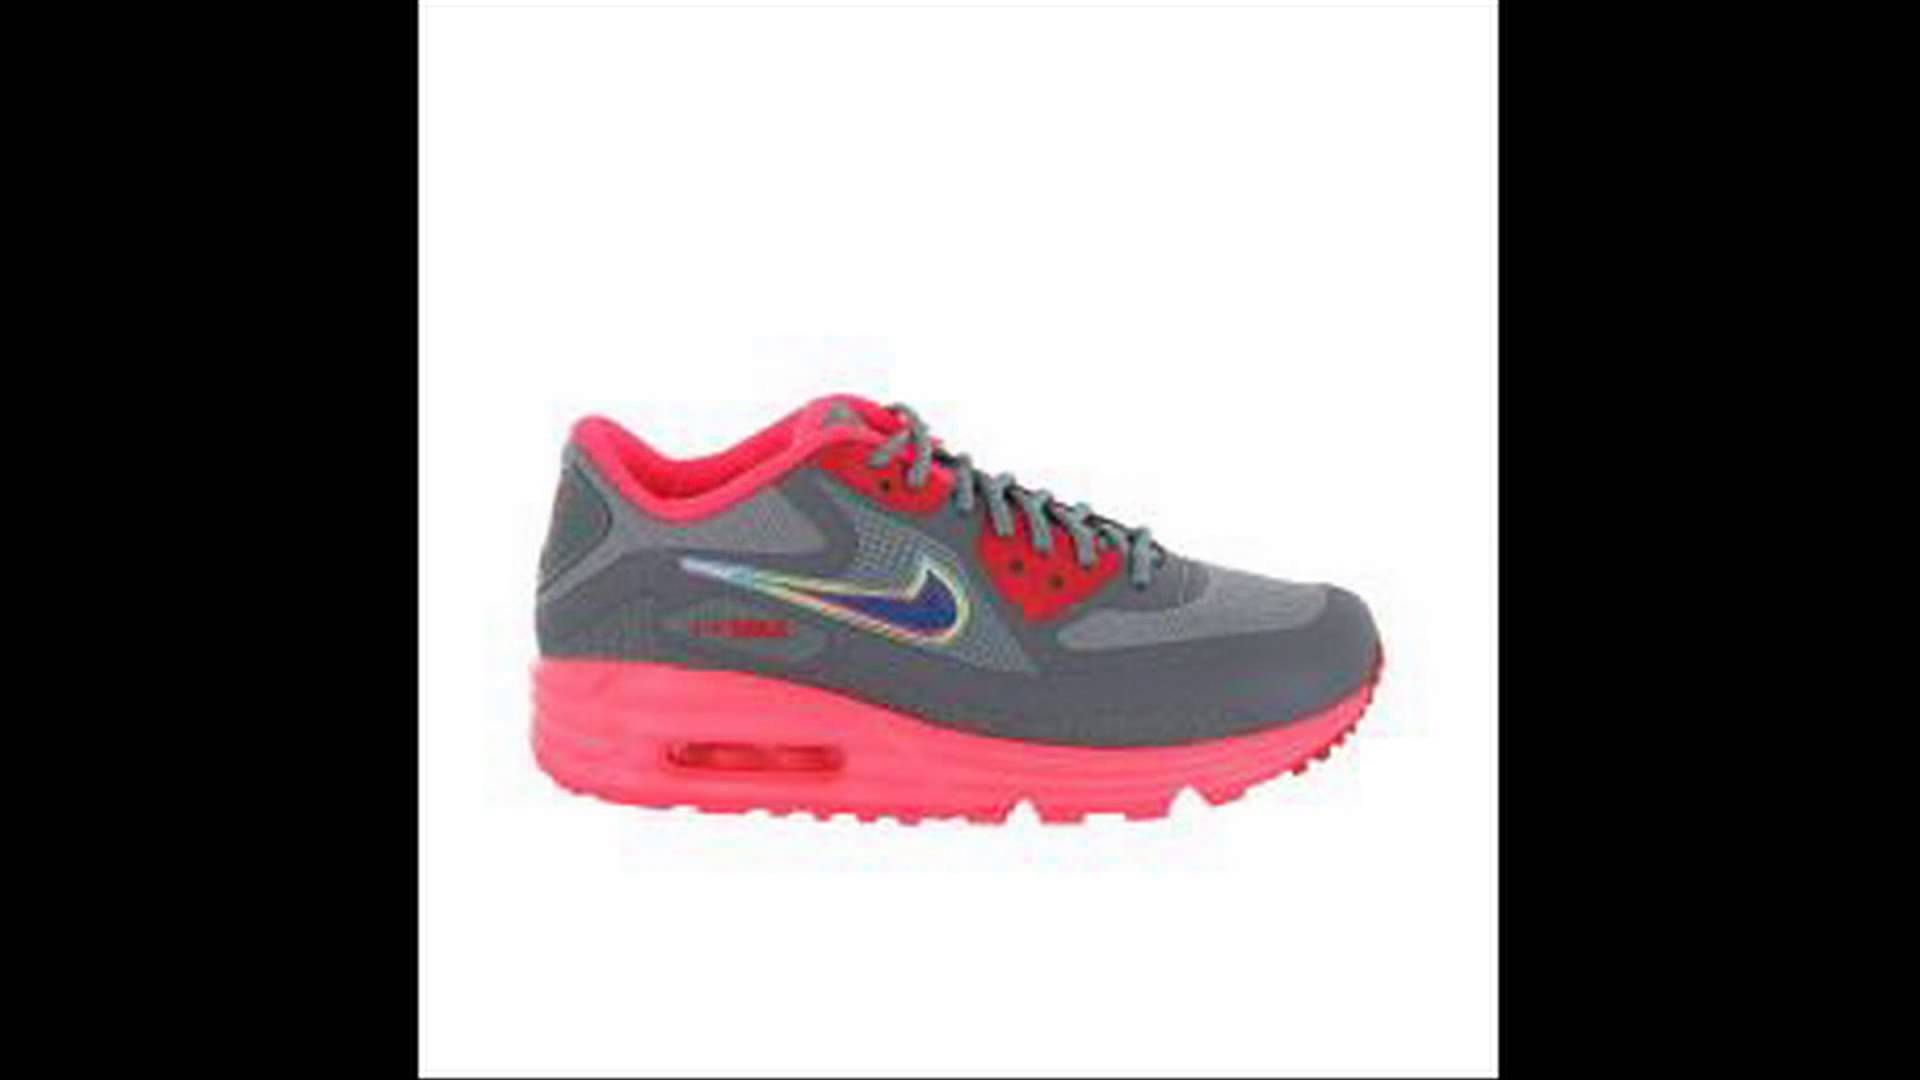 brand new ddc44 20df0 ... promo code for nike air max erkek ayakkablar korayspor nike c5309 0c8ae